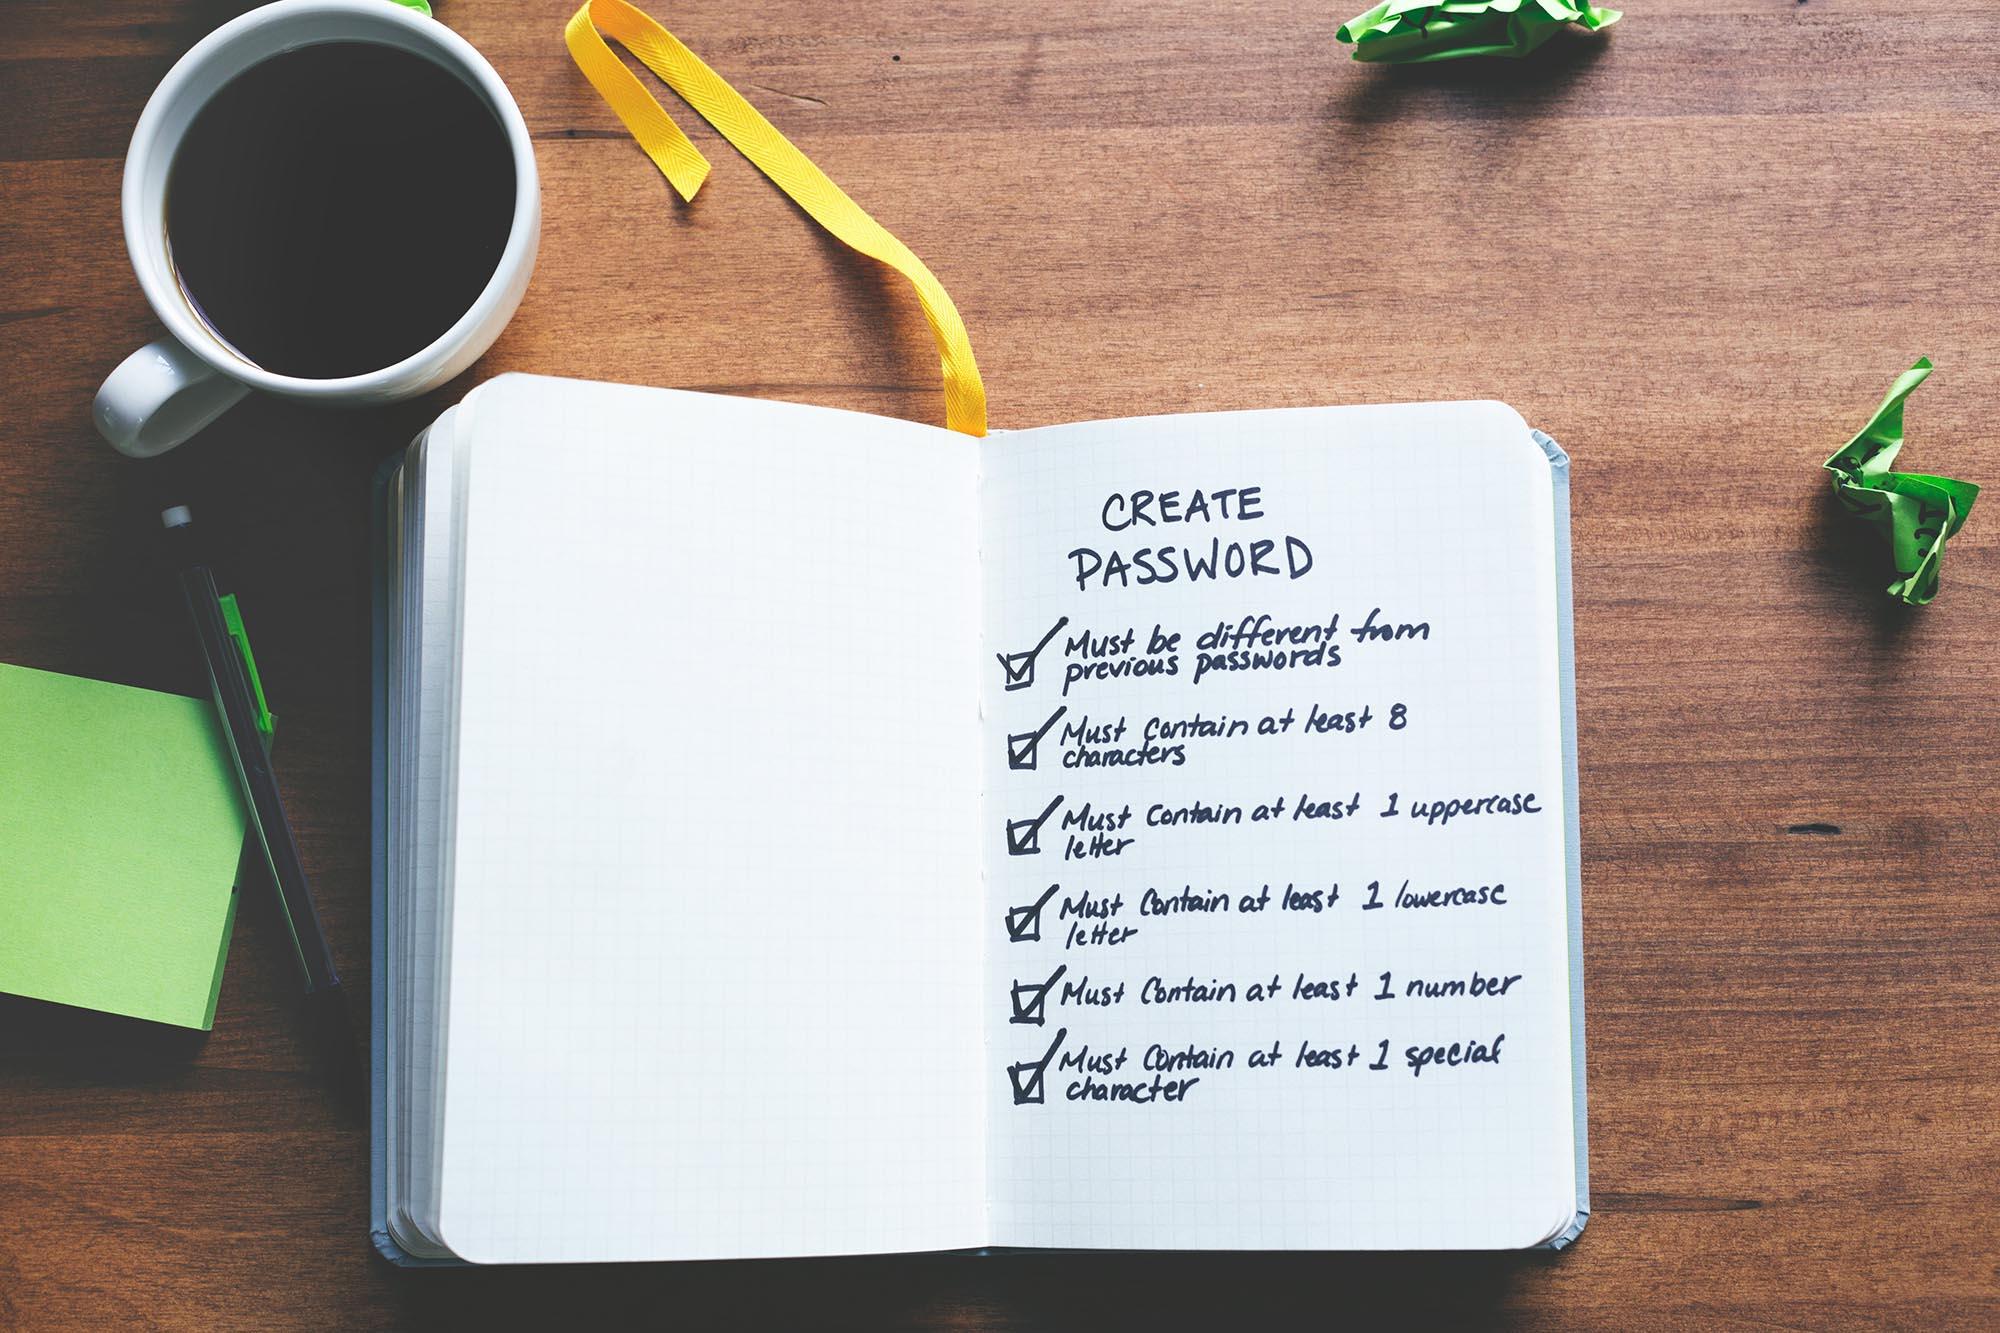 a notebook with password criteria checklist